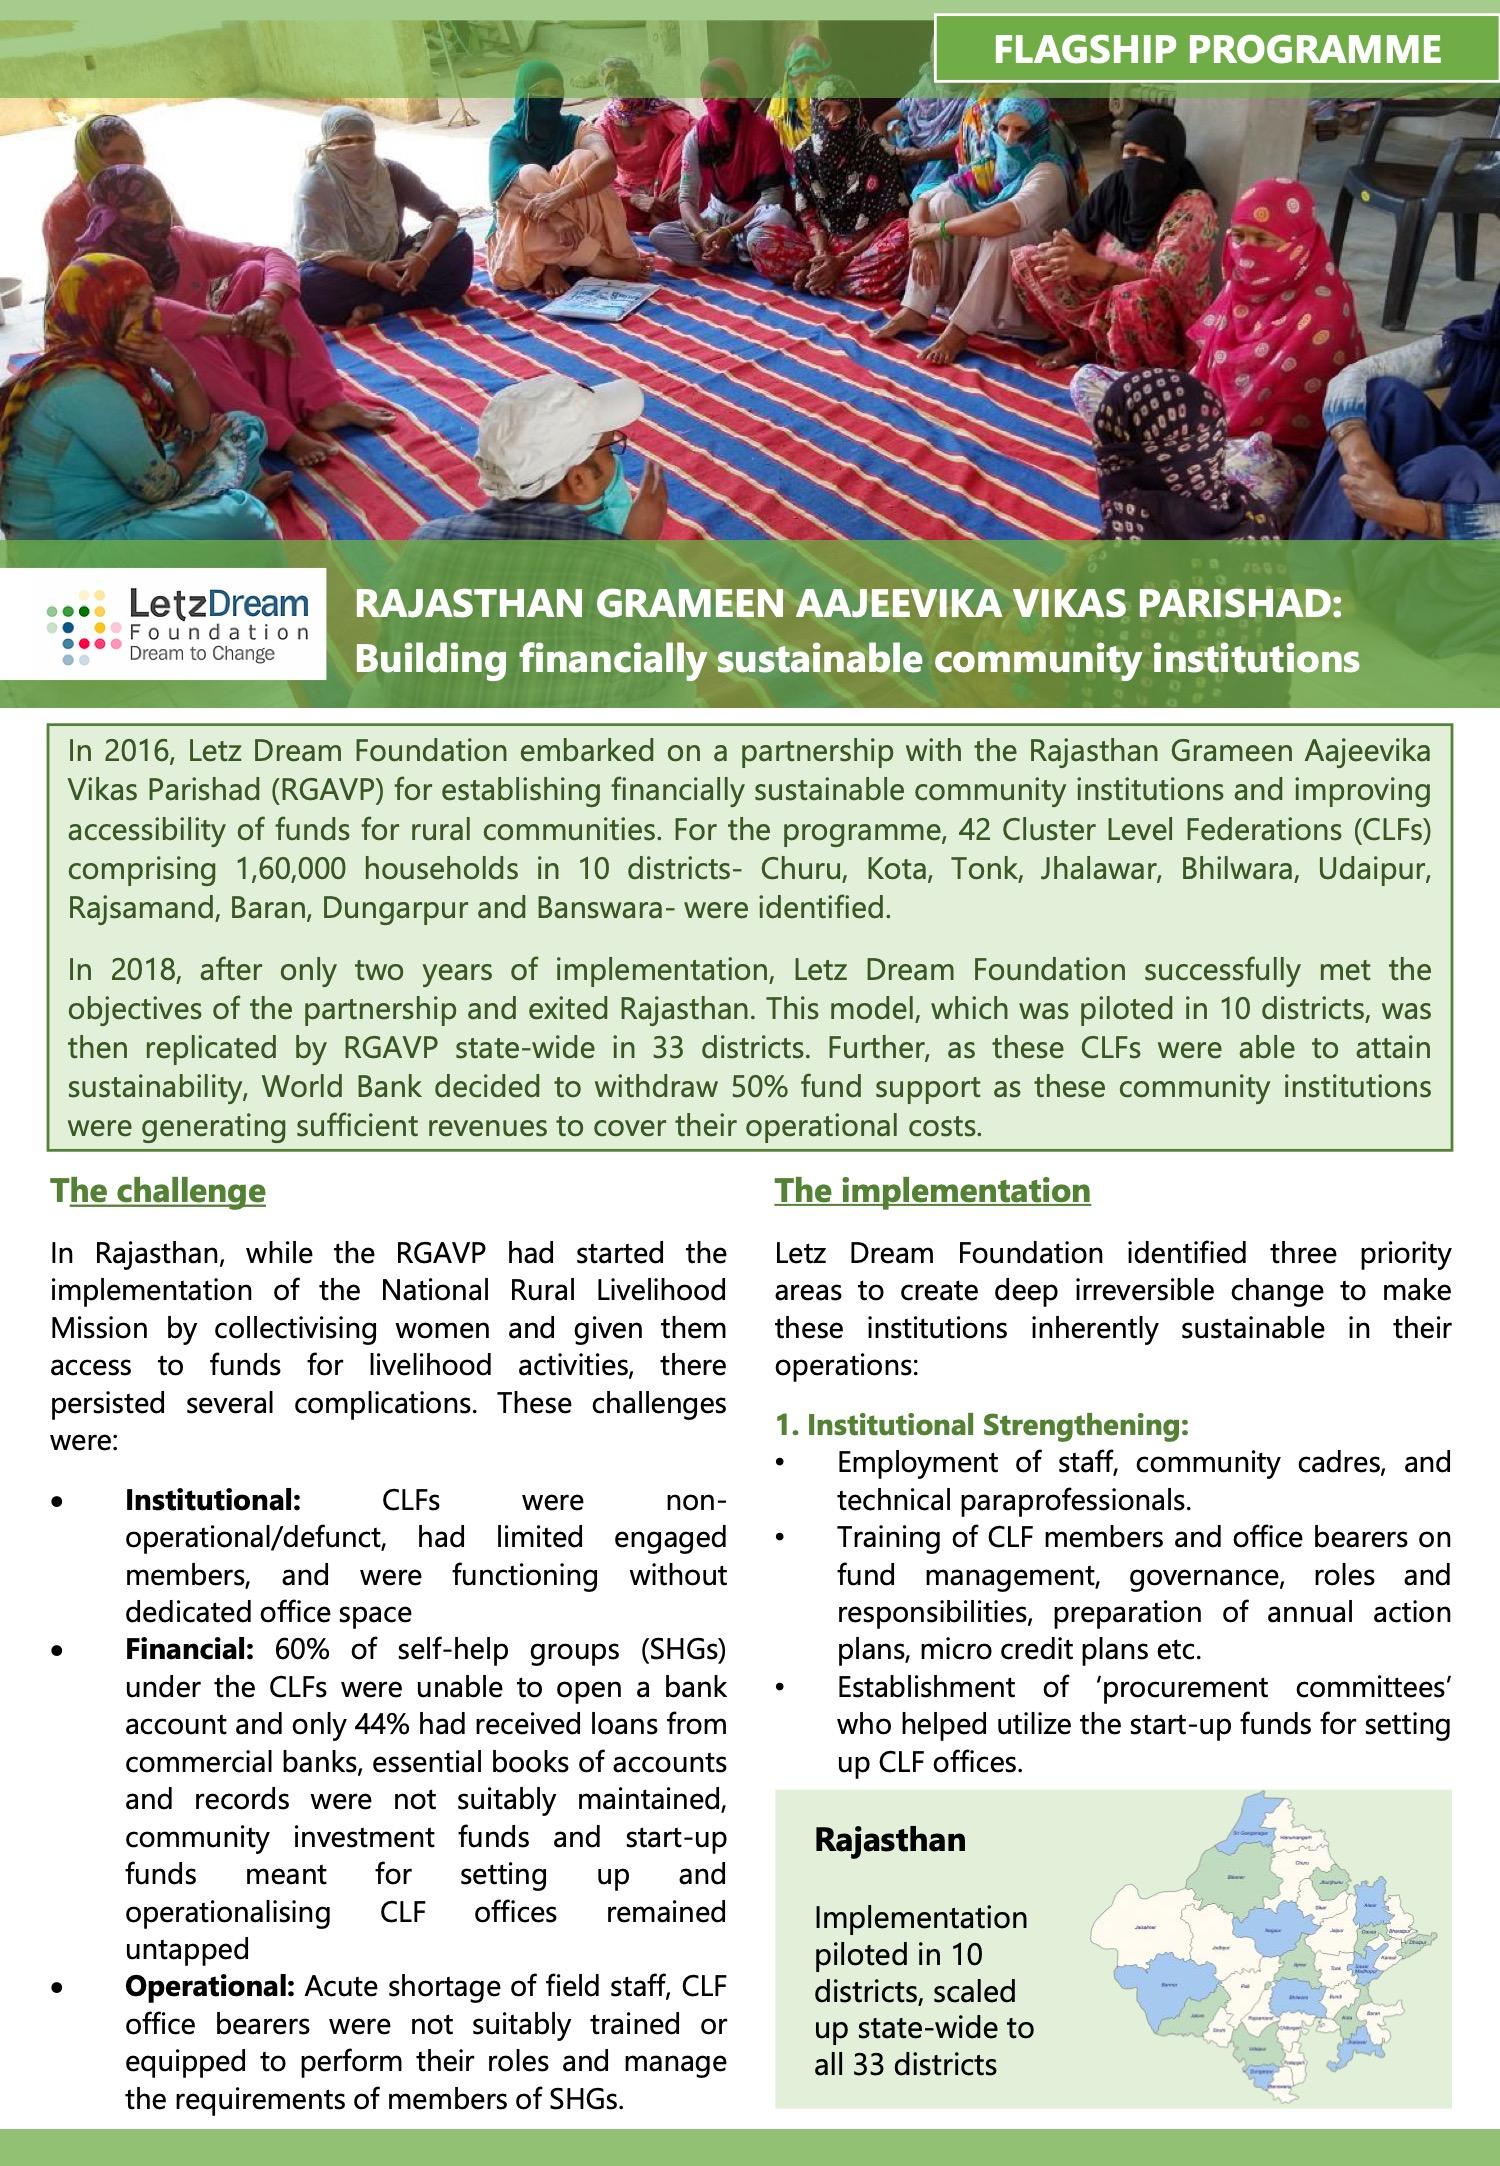 v2_Rajasthan Grameen Aajeevika Vikas Parishad_At a Glance Document